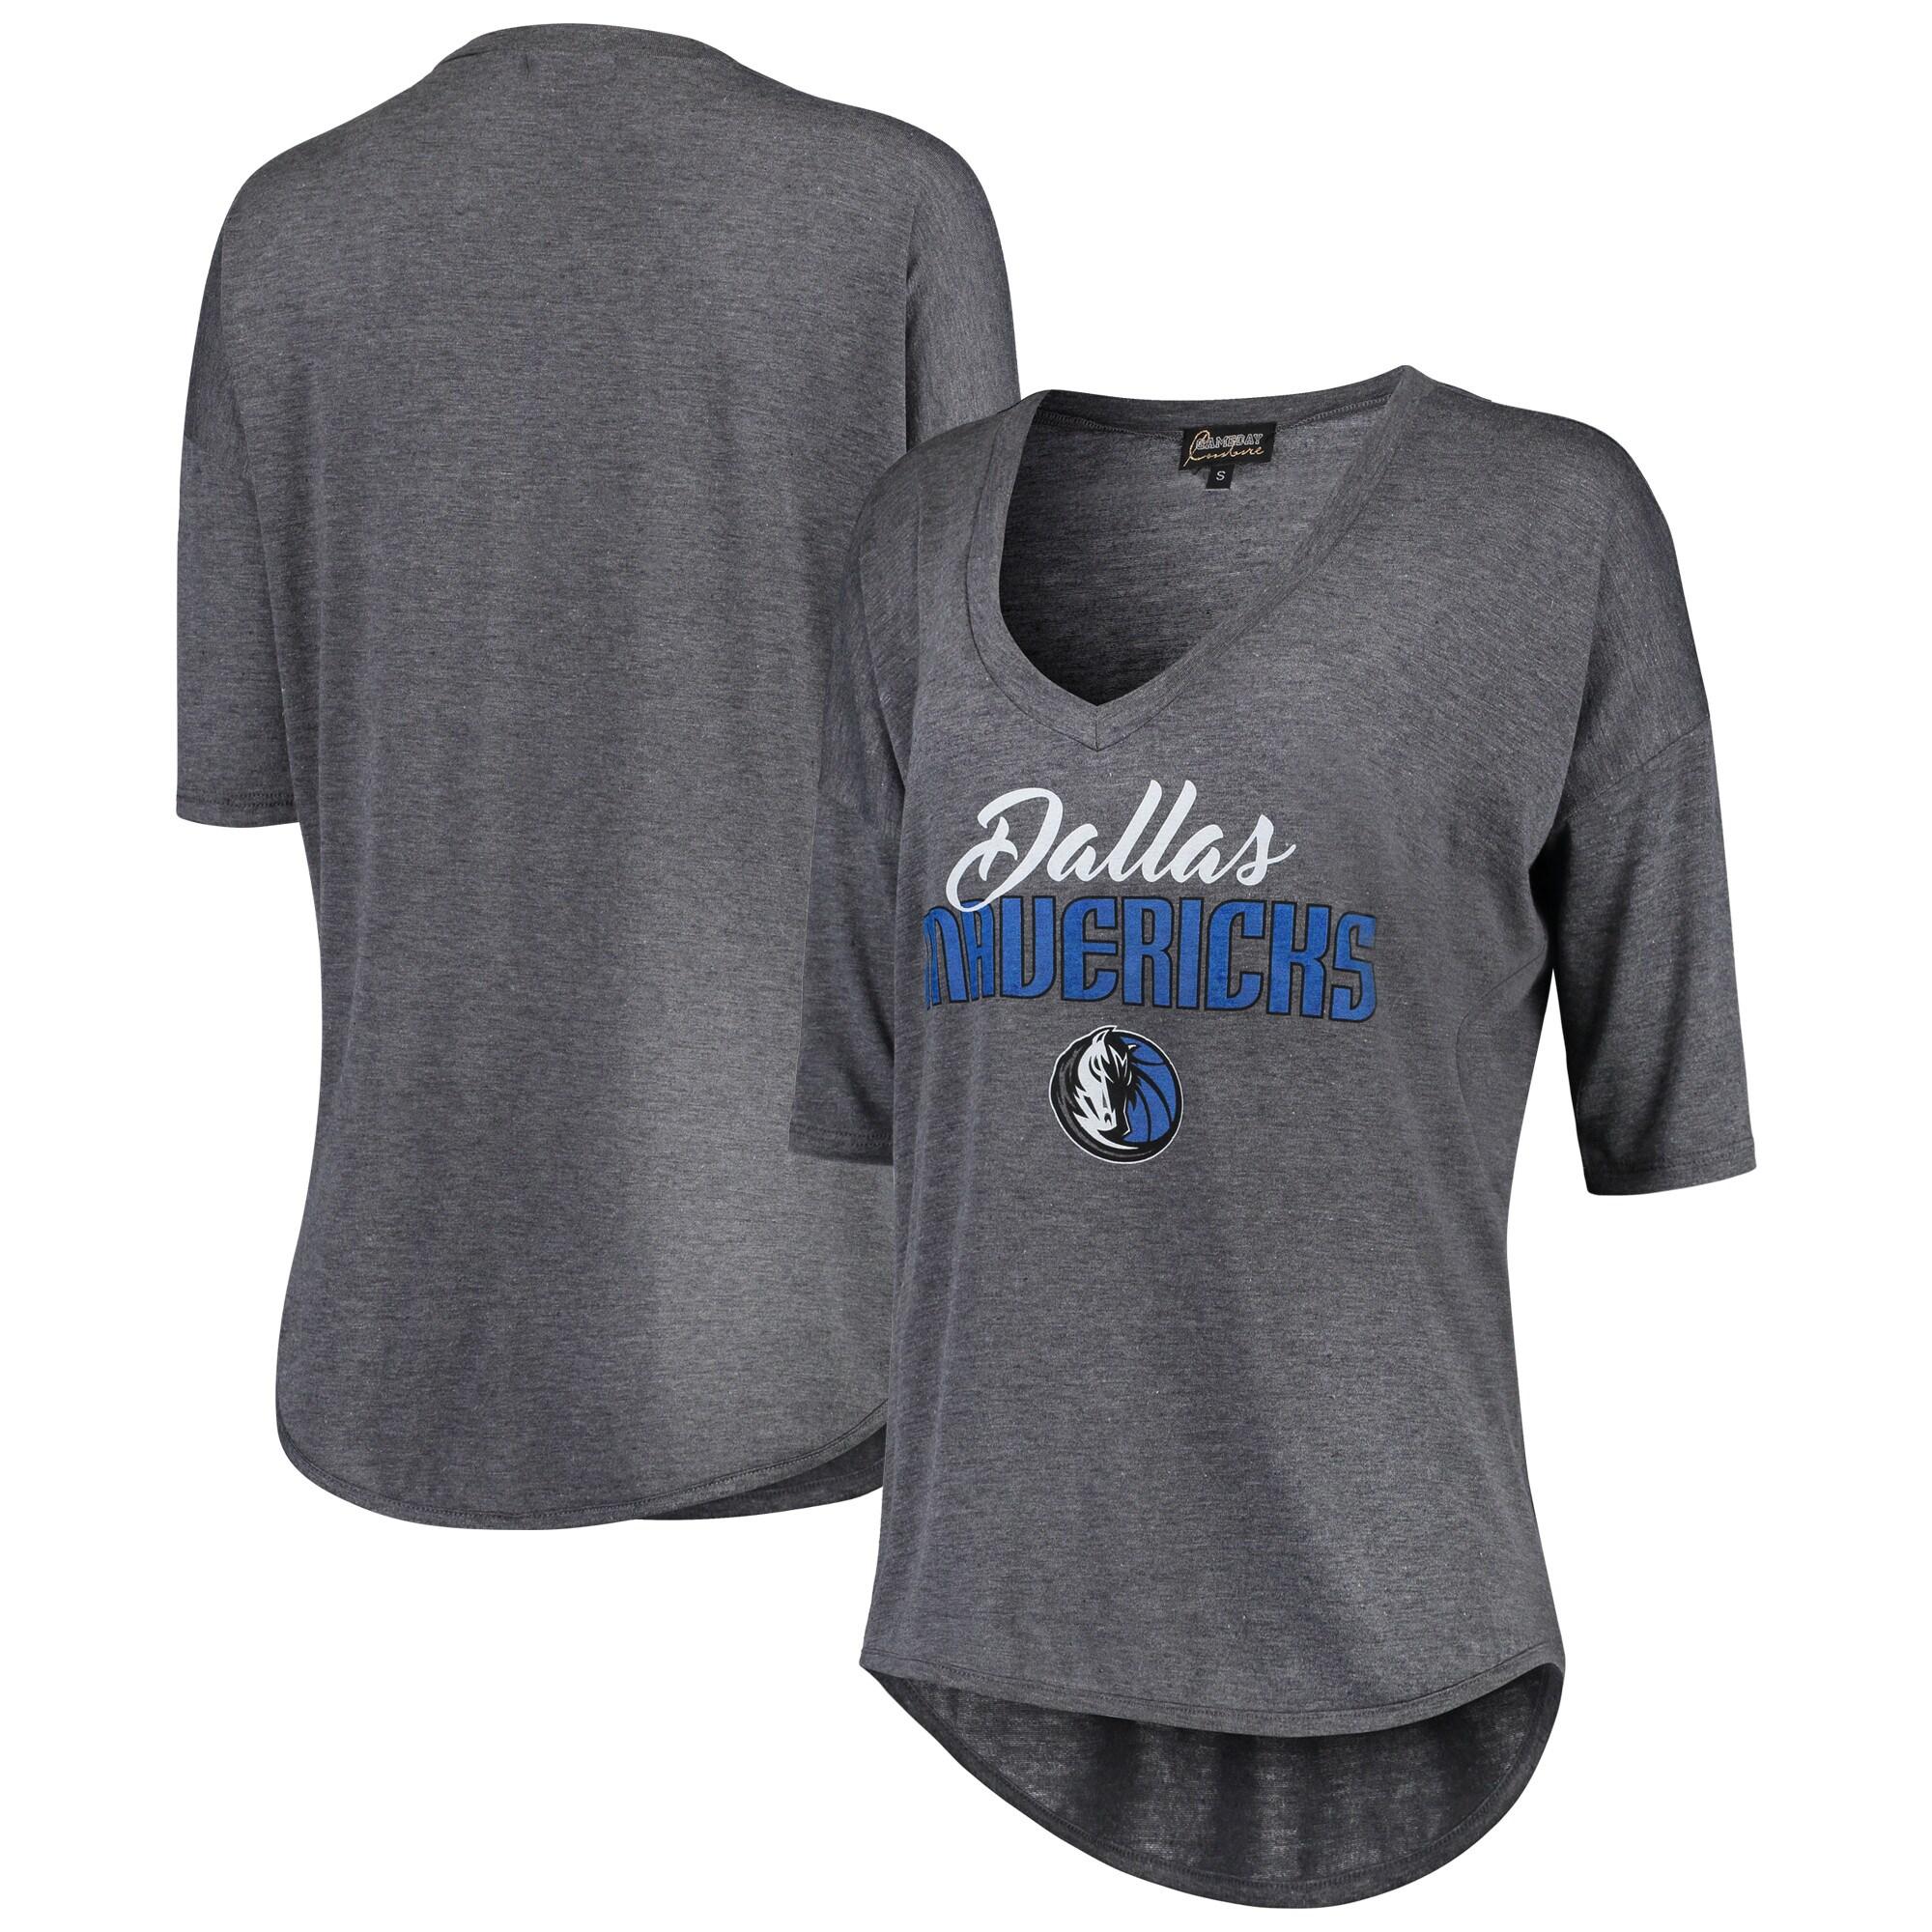 Dallas Mavericks Women's Deep V-Neck Tri-Blend Half-Sleeve T-Shirt - Gray